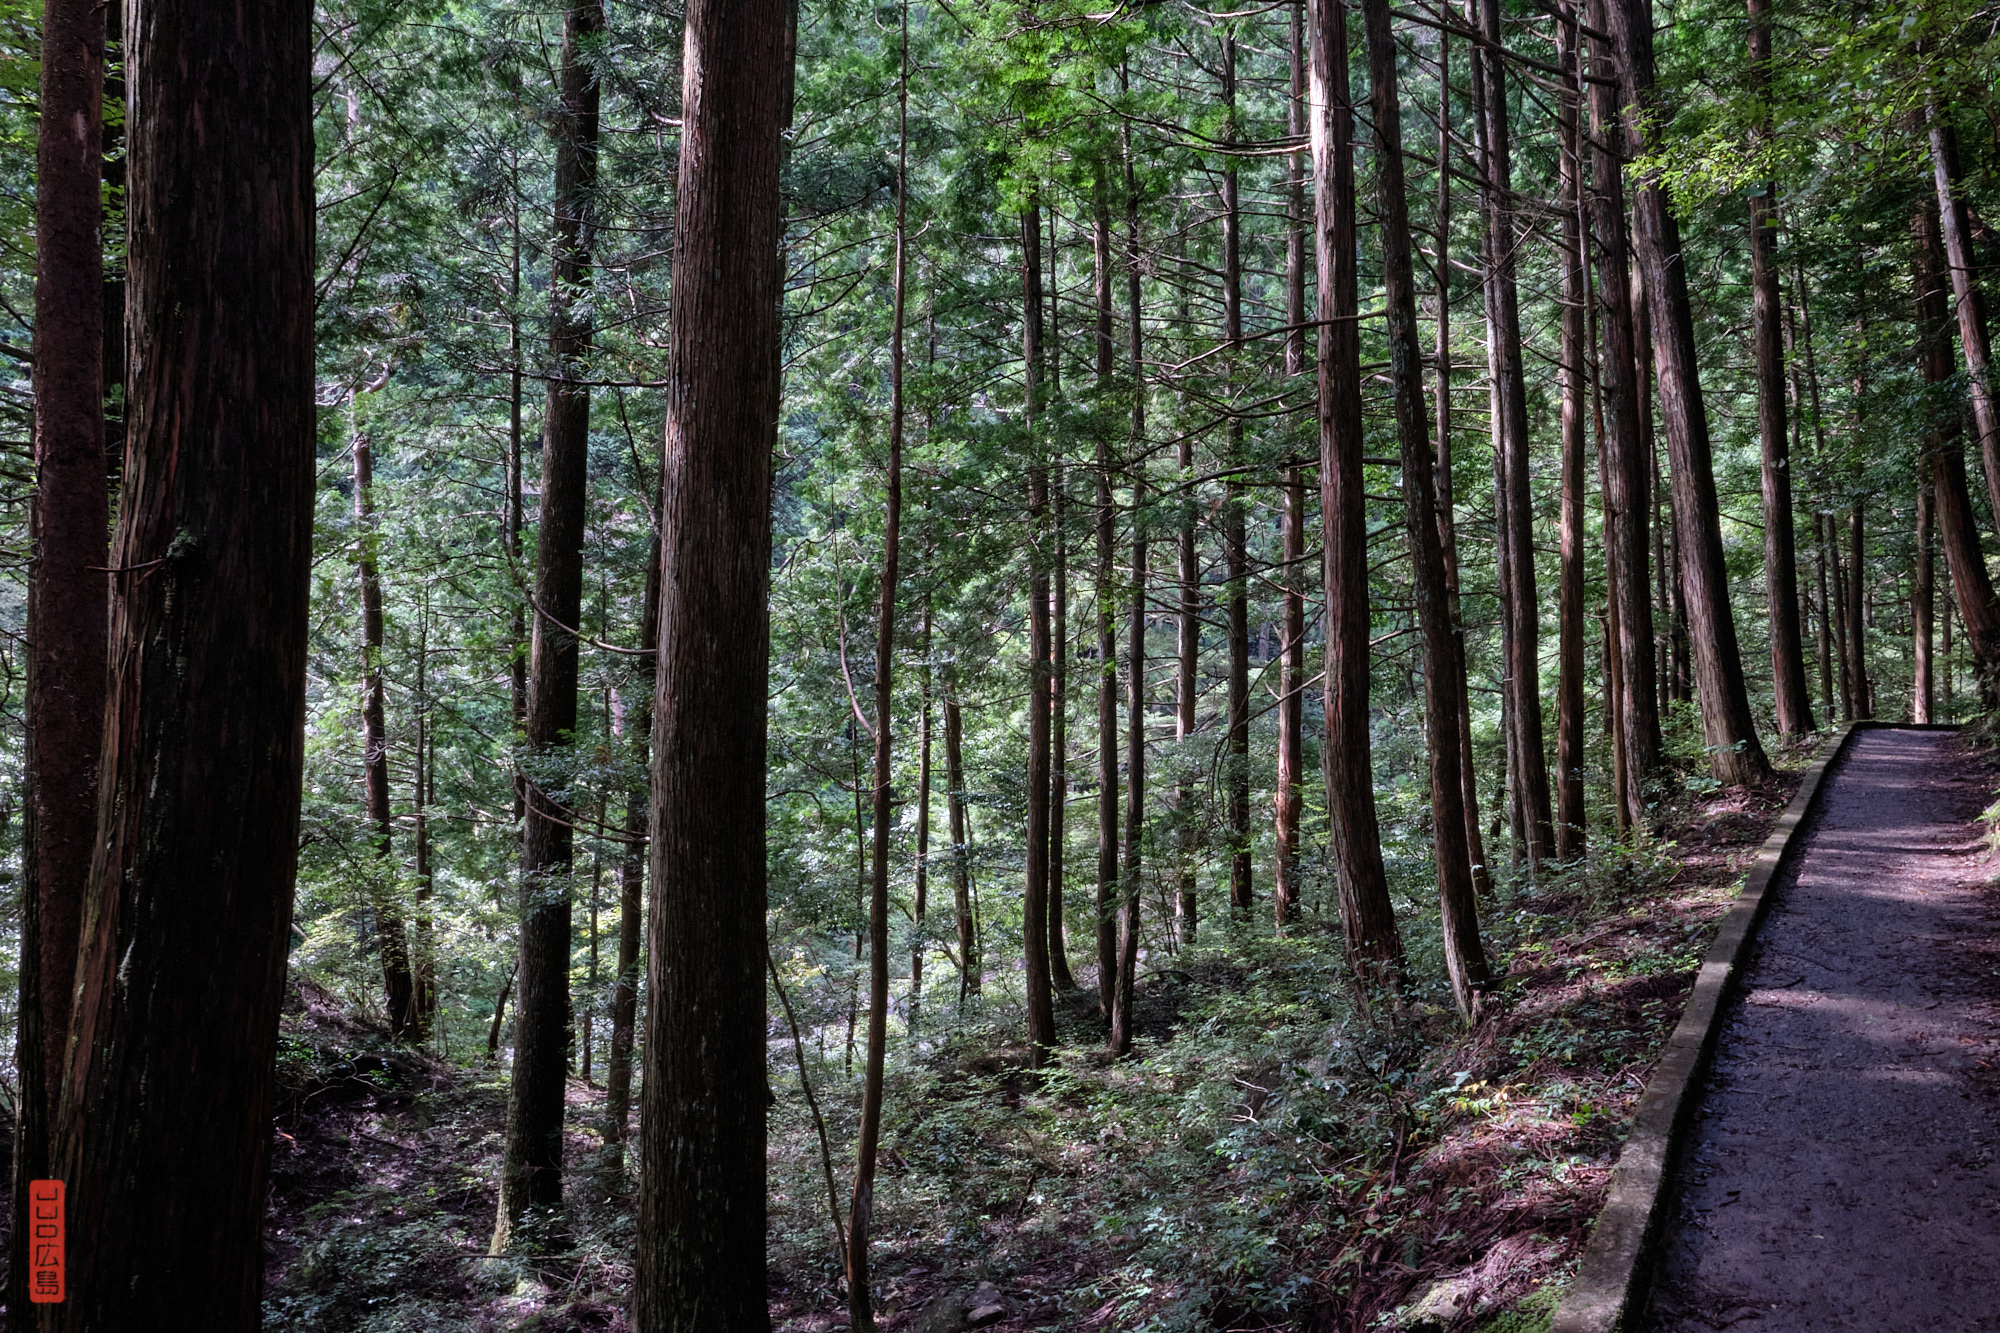 Sentier dans la forêt à Sandankyo, Hiroshima